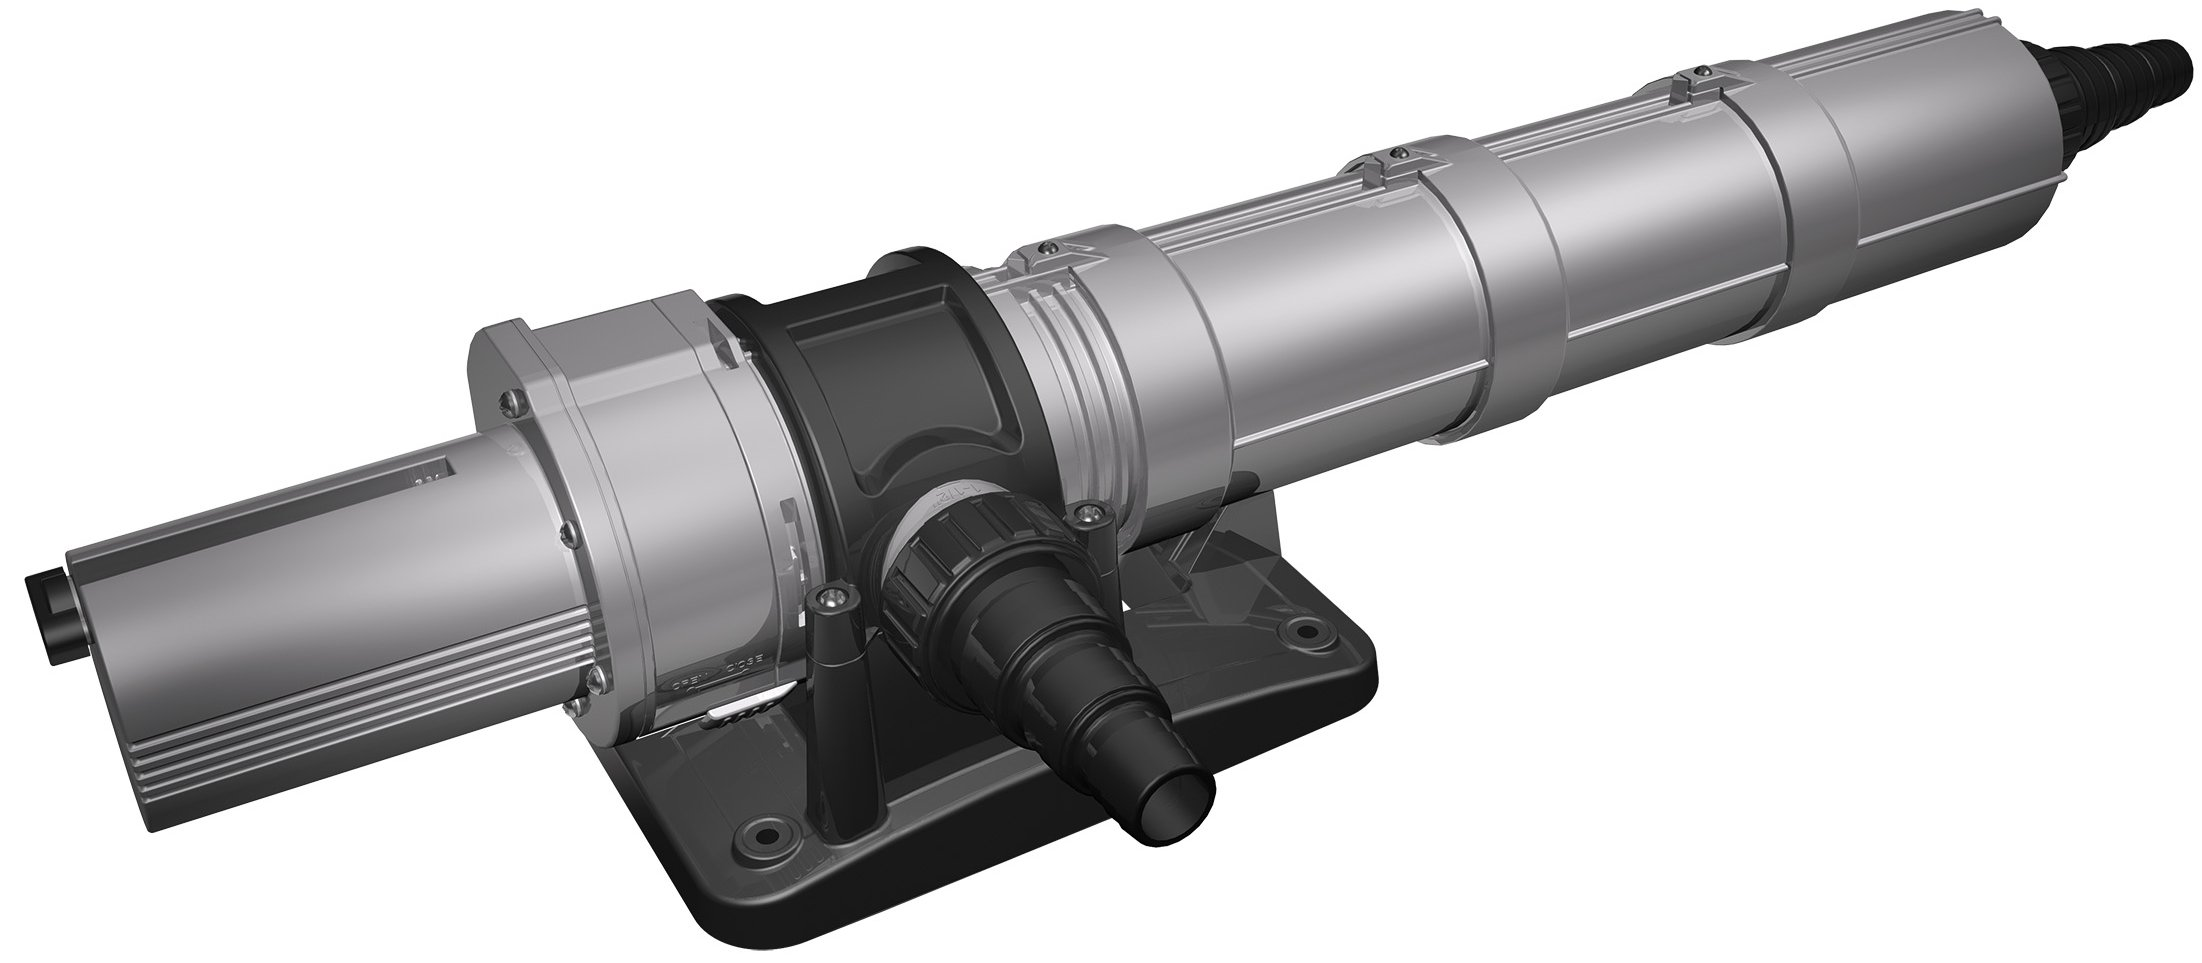 Preise JBL ProCristal UV-C Klärer 36 W